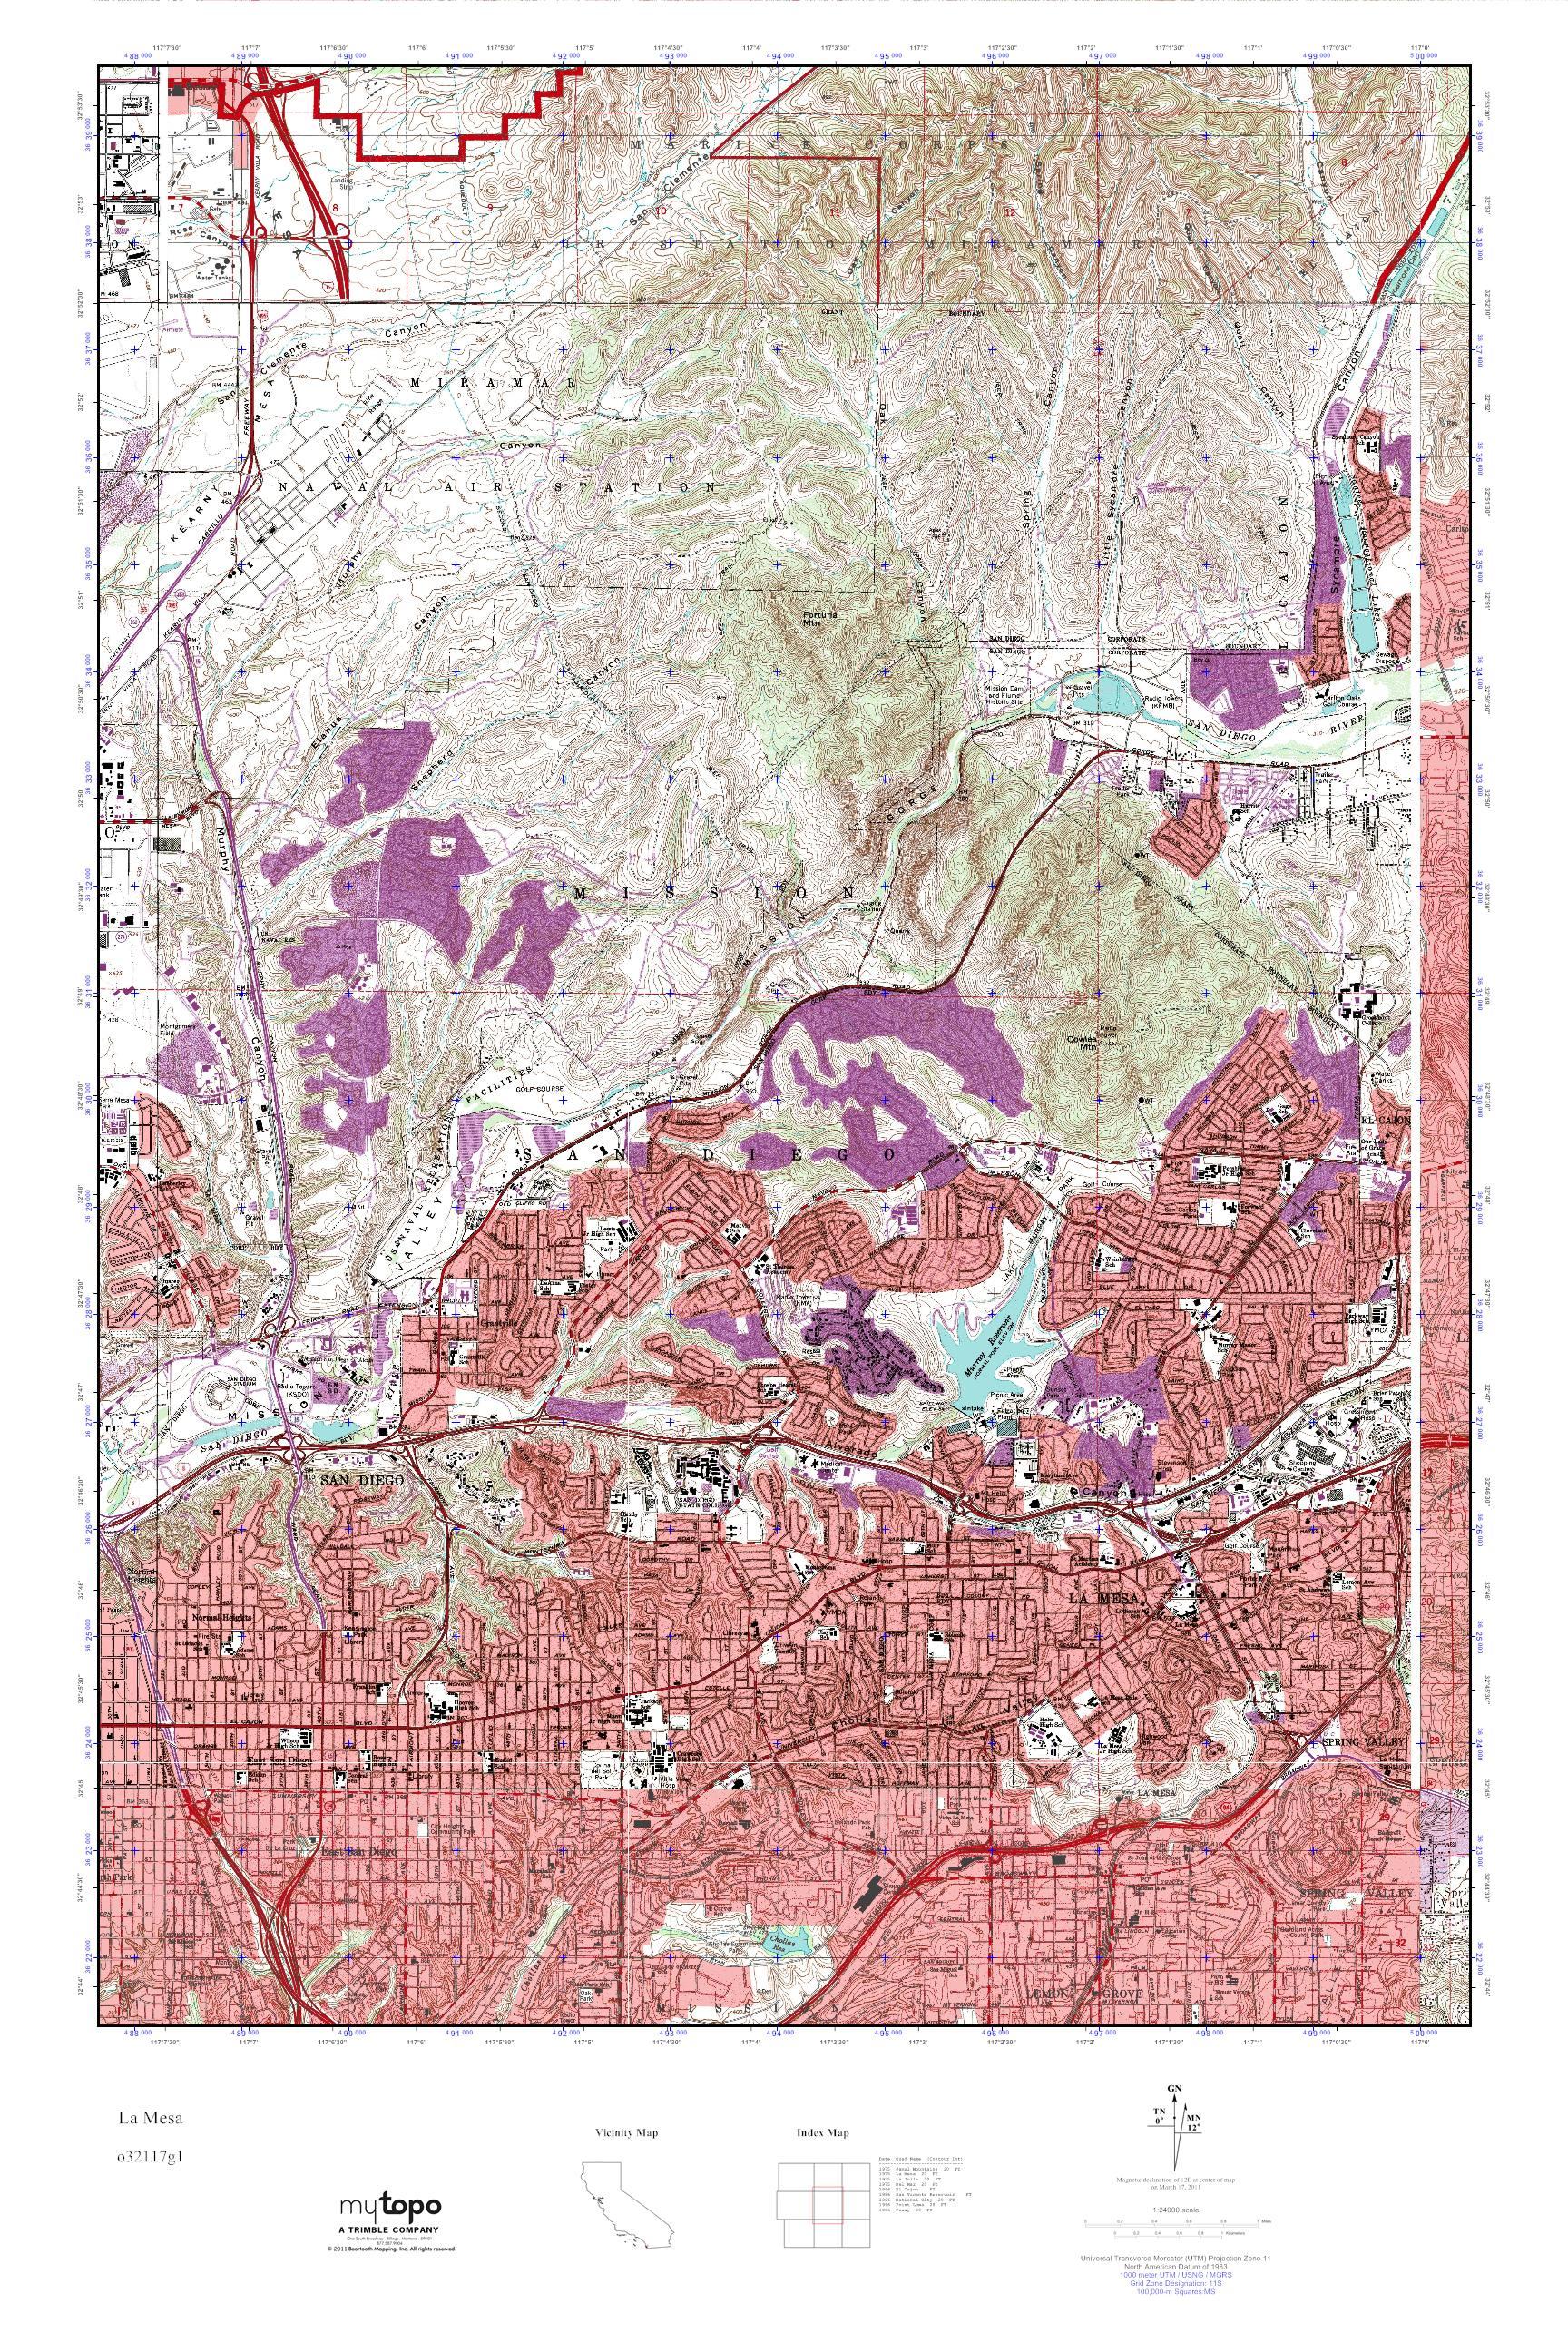 Mytopo La Mesa California Usgs Quad Topo Map